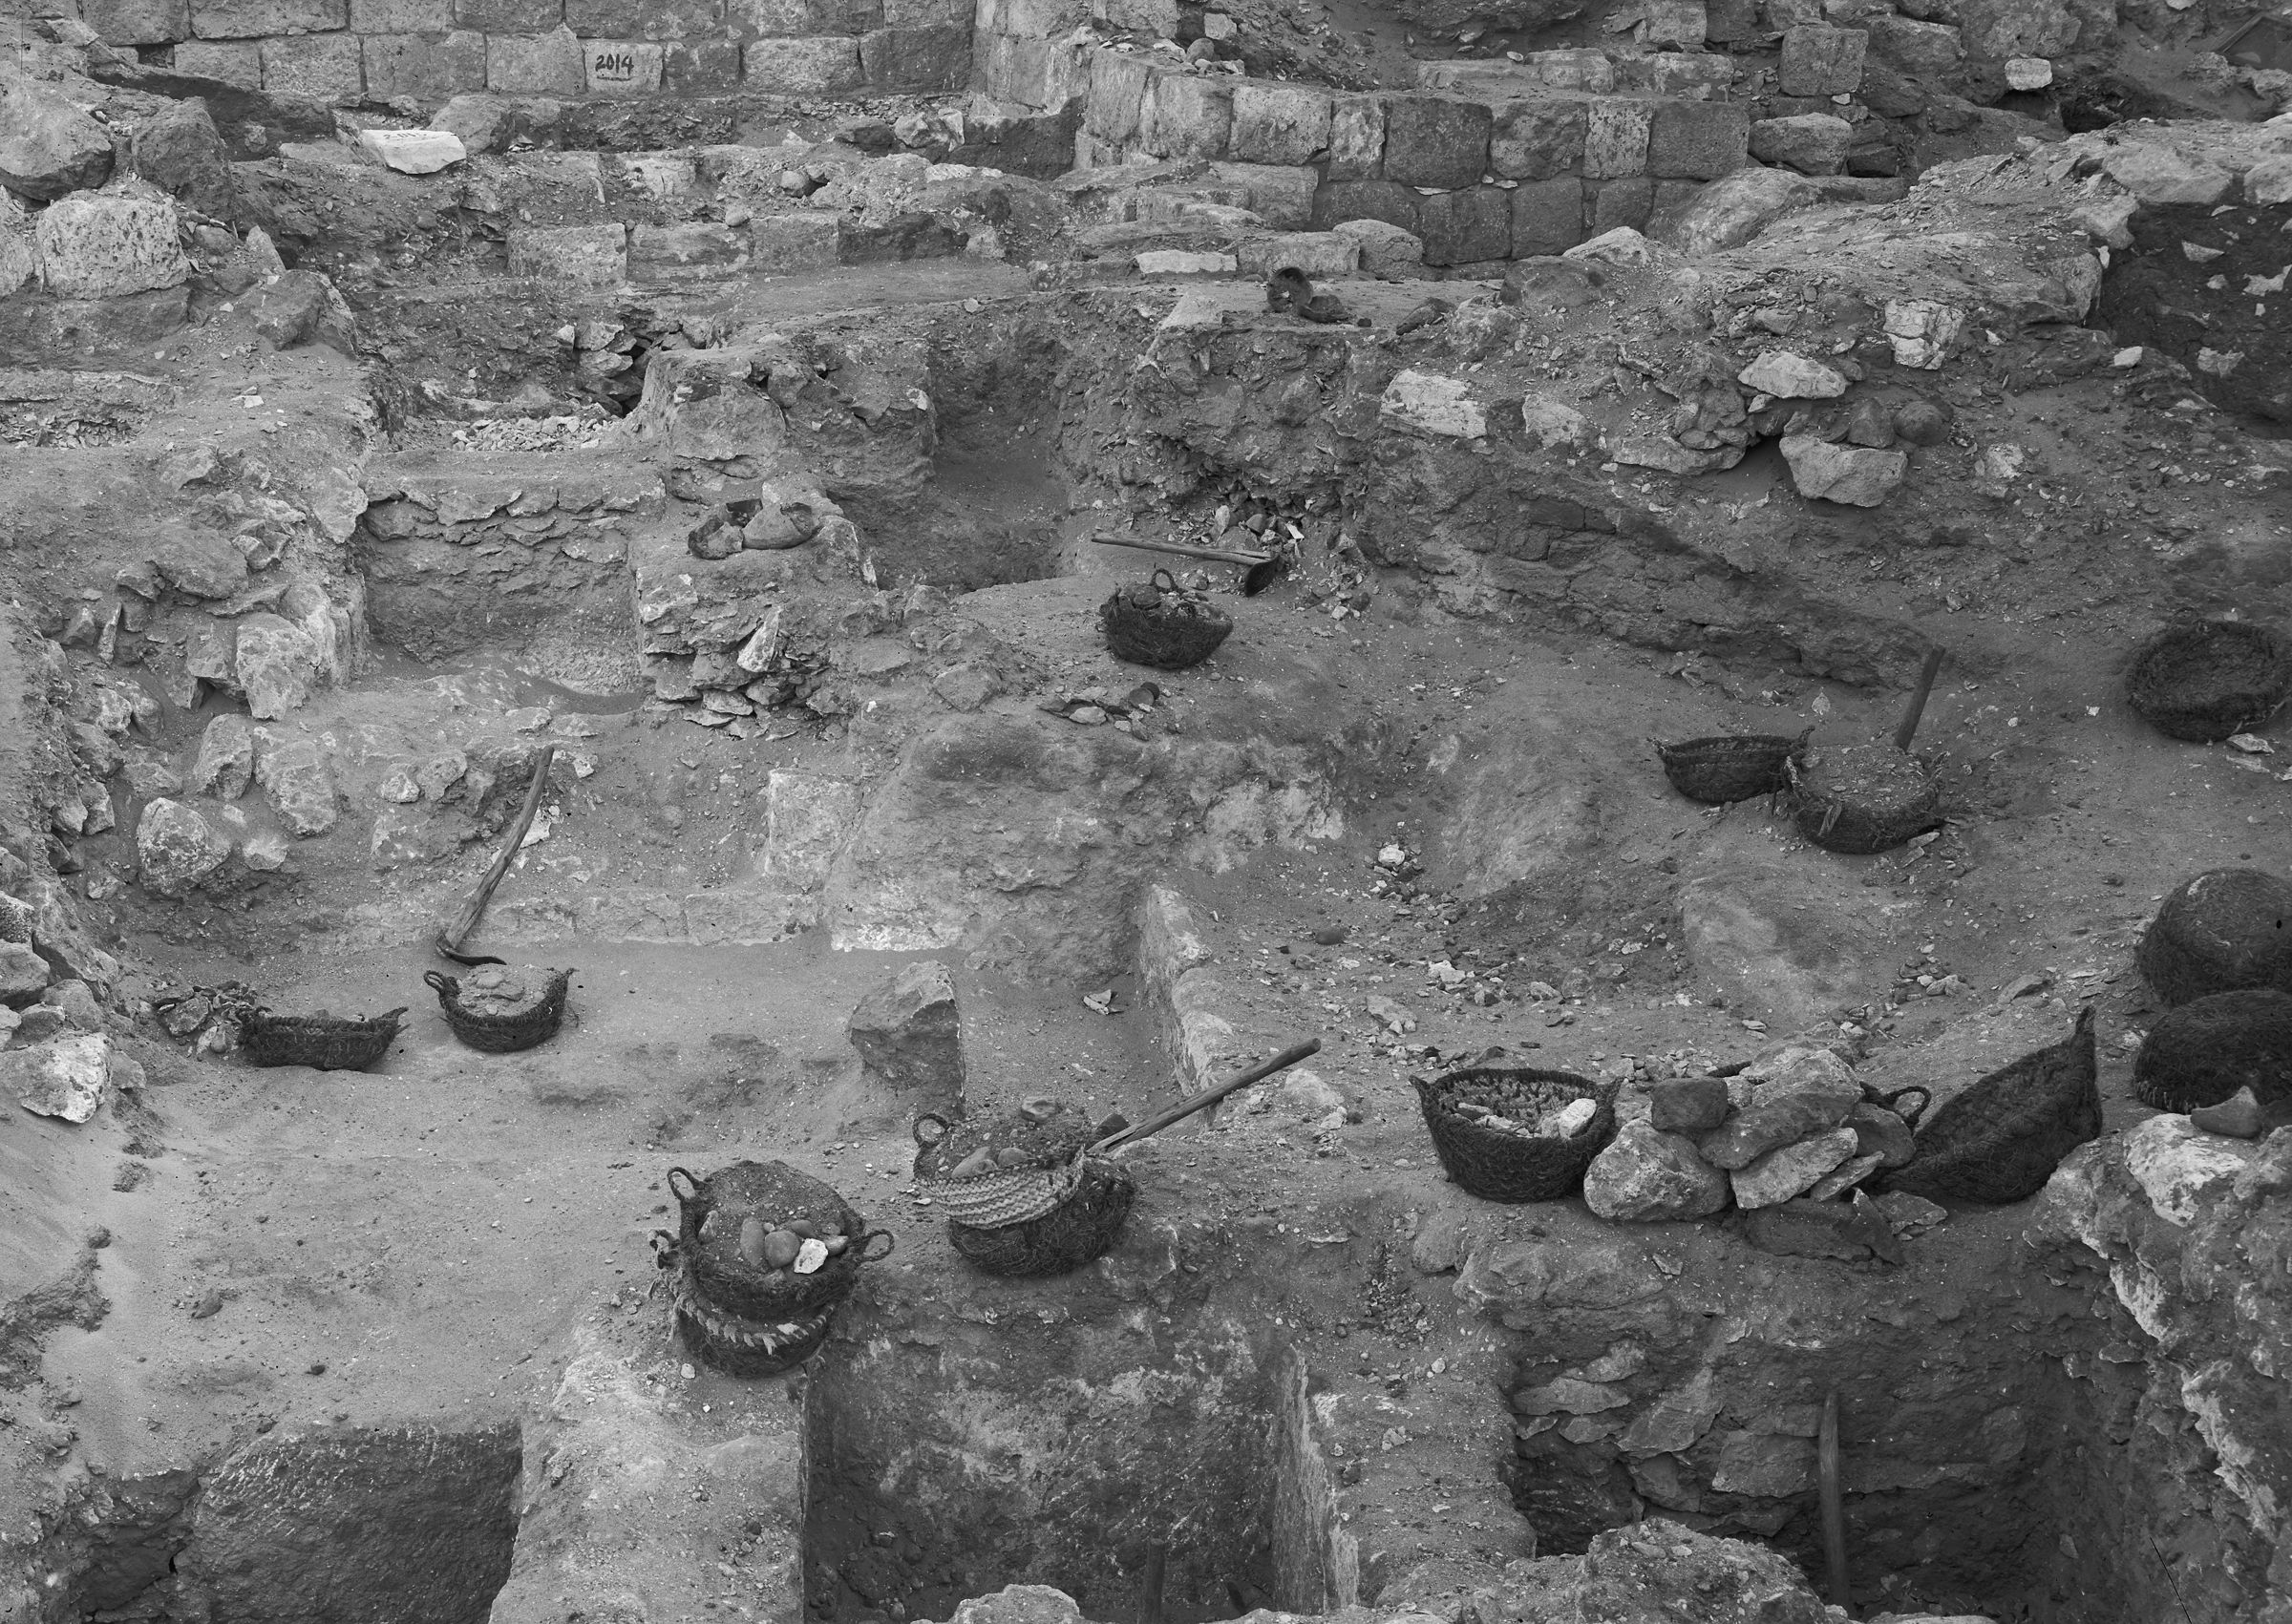 Western Cemetery: Site: Giza; View: G 2014, G 2013, G 2017, G 2016, G 2015